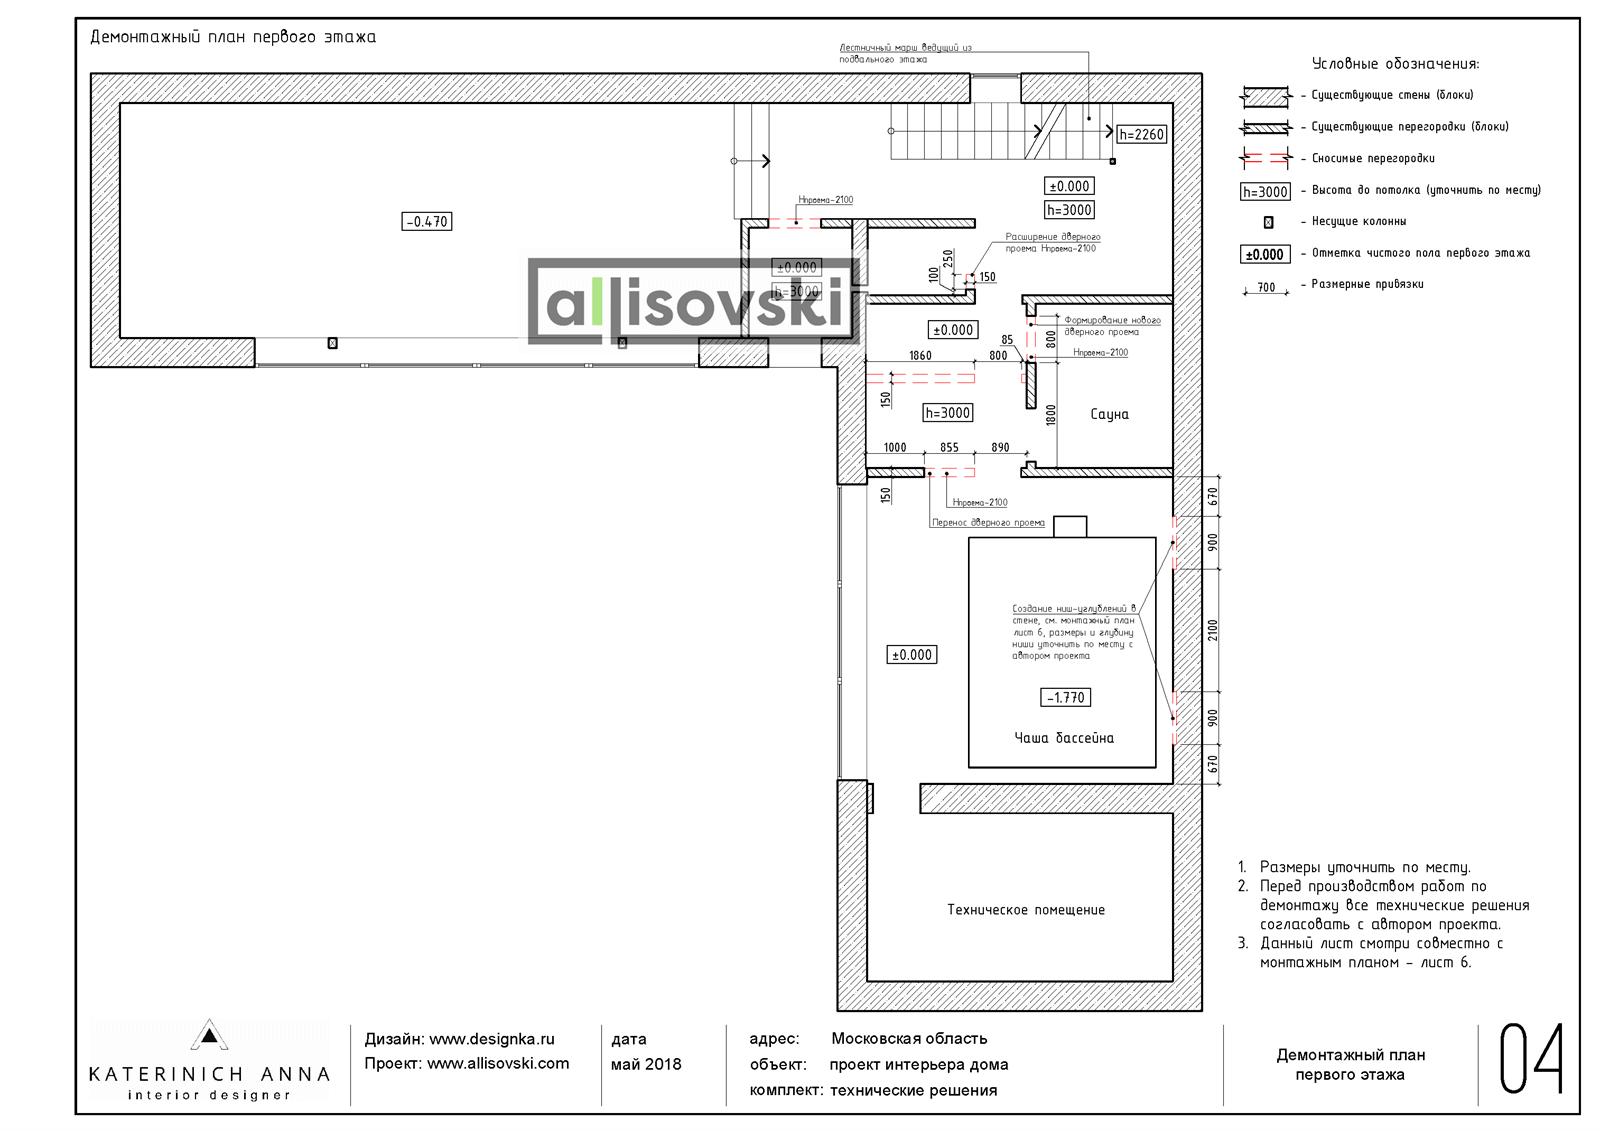 Демонтажный план первого этажа пример чертеж демонтаж